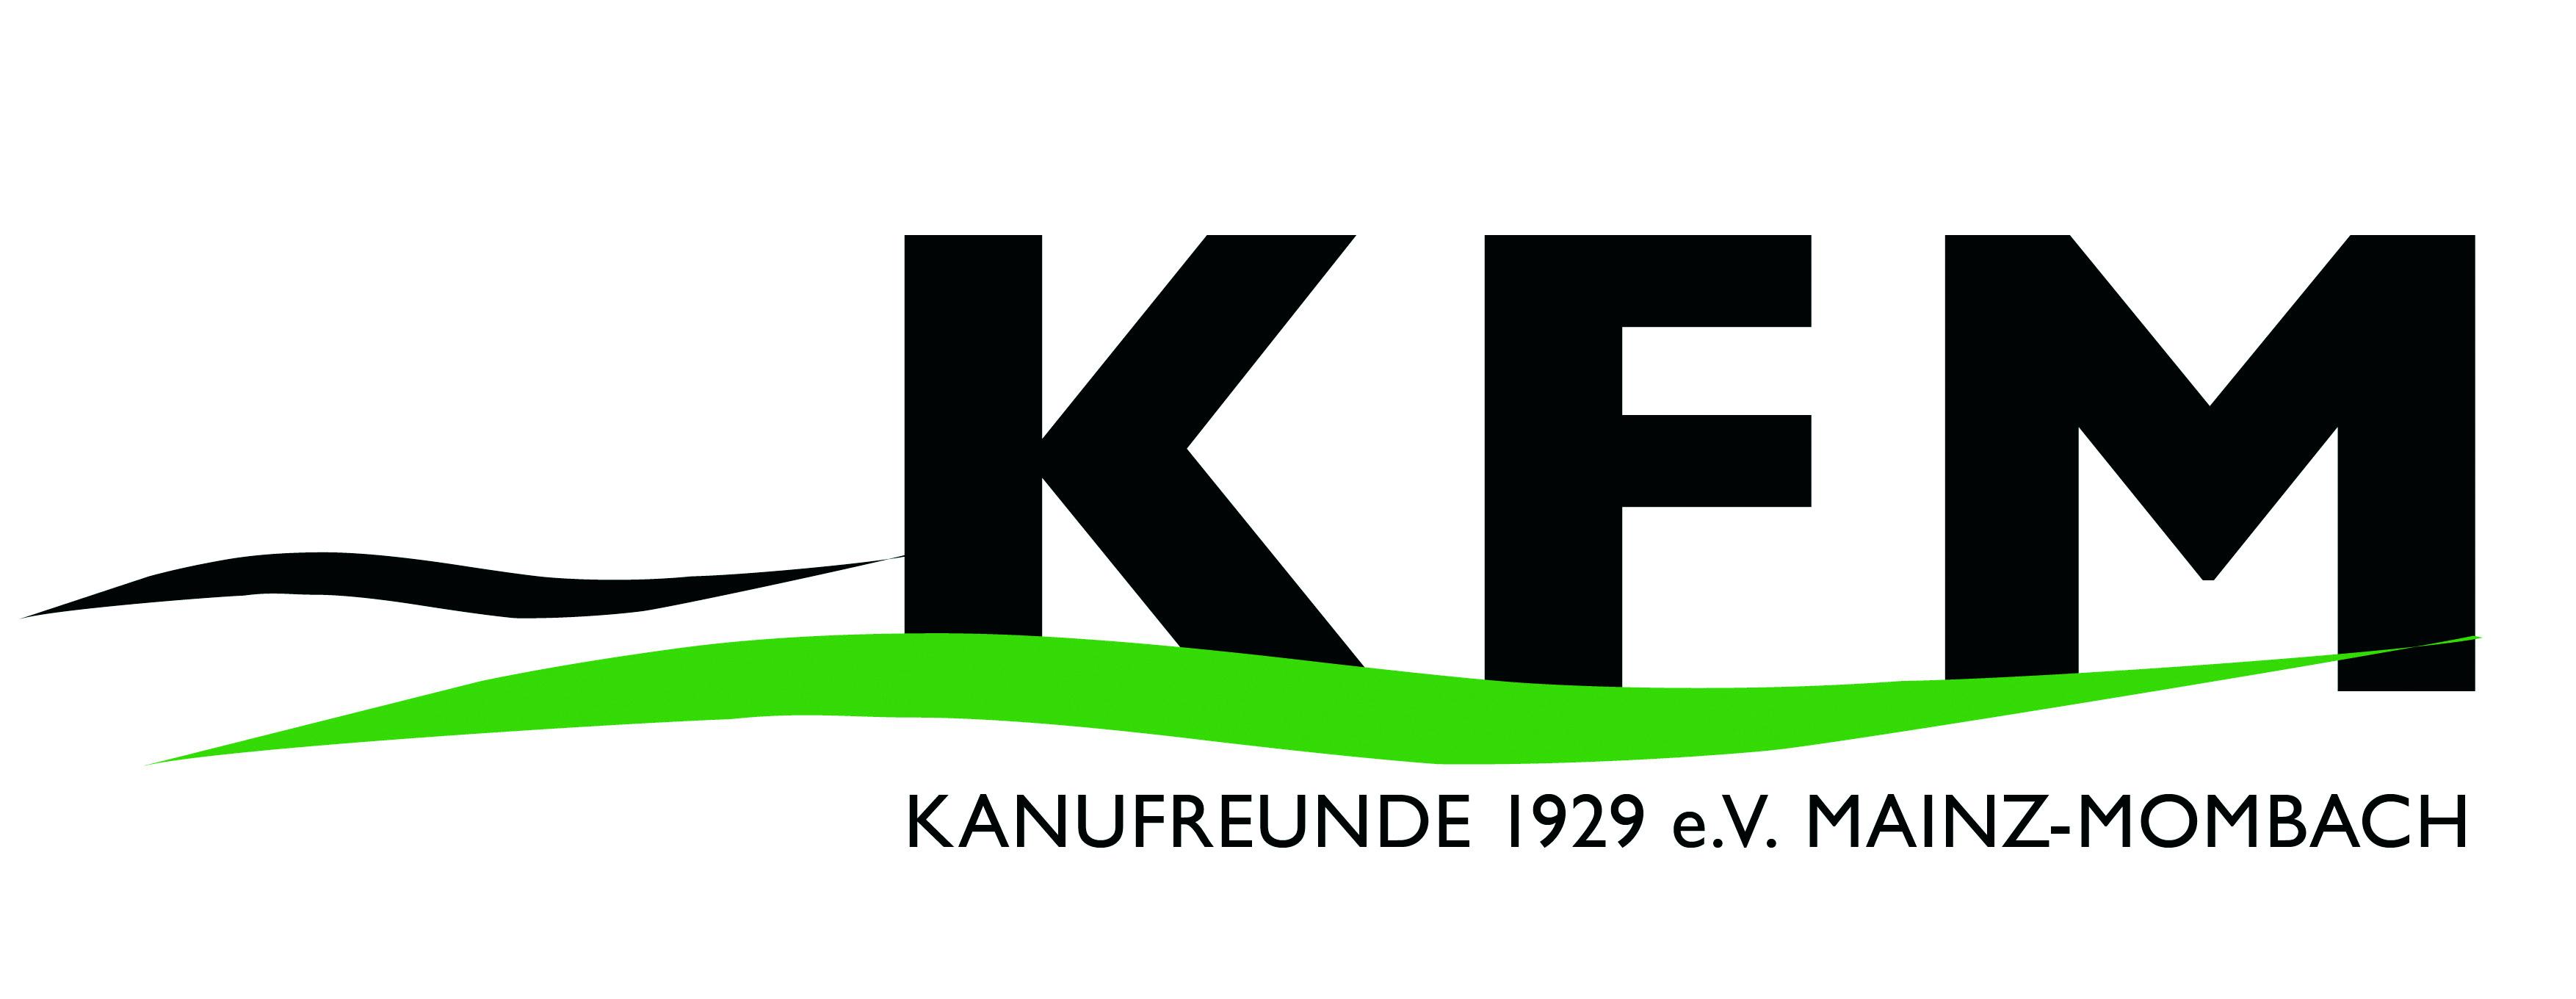 Kanufreunde 1929 e.V. Mainz-Mombach